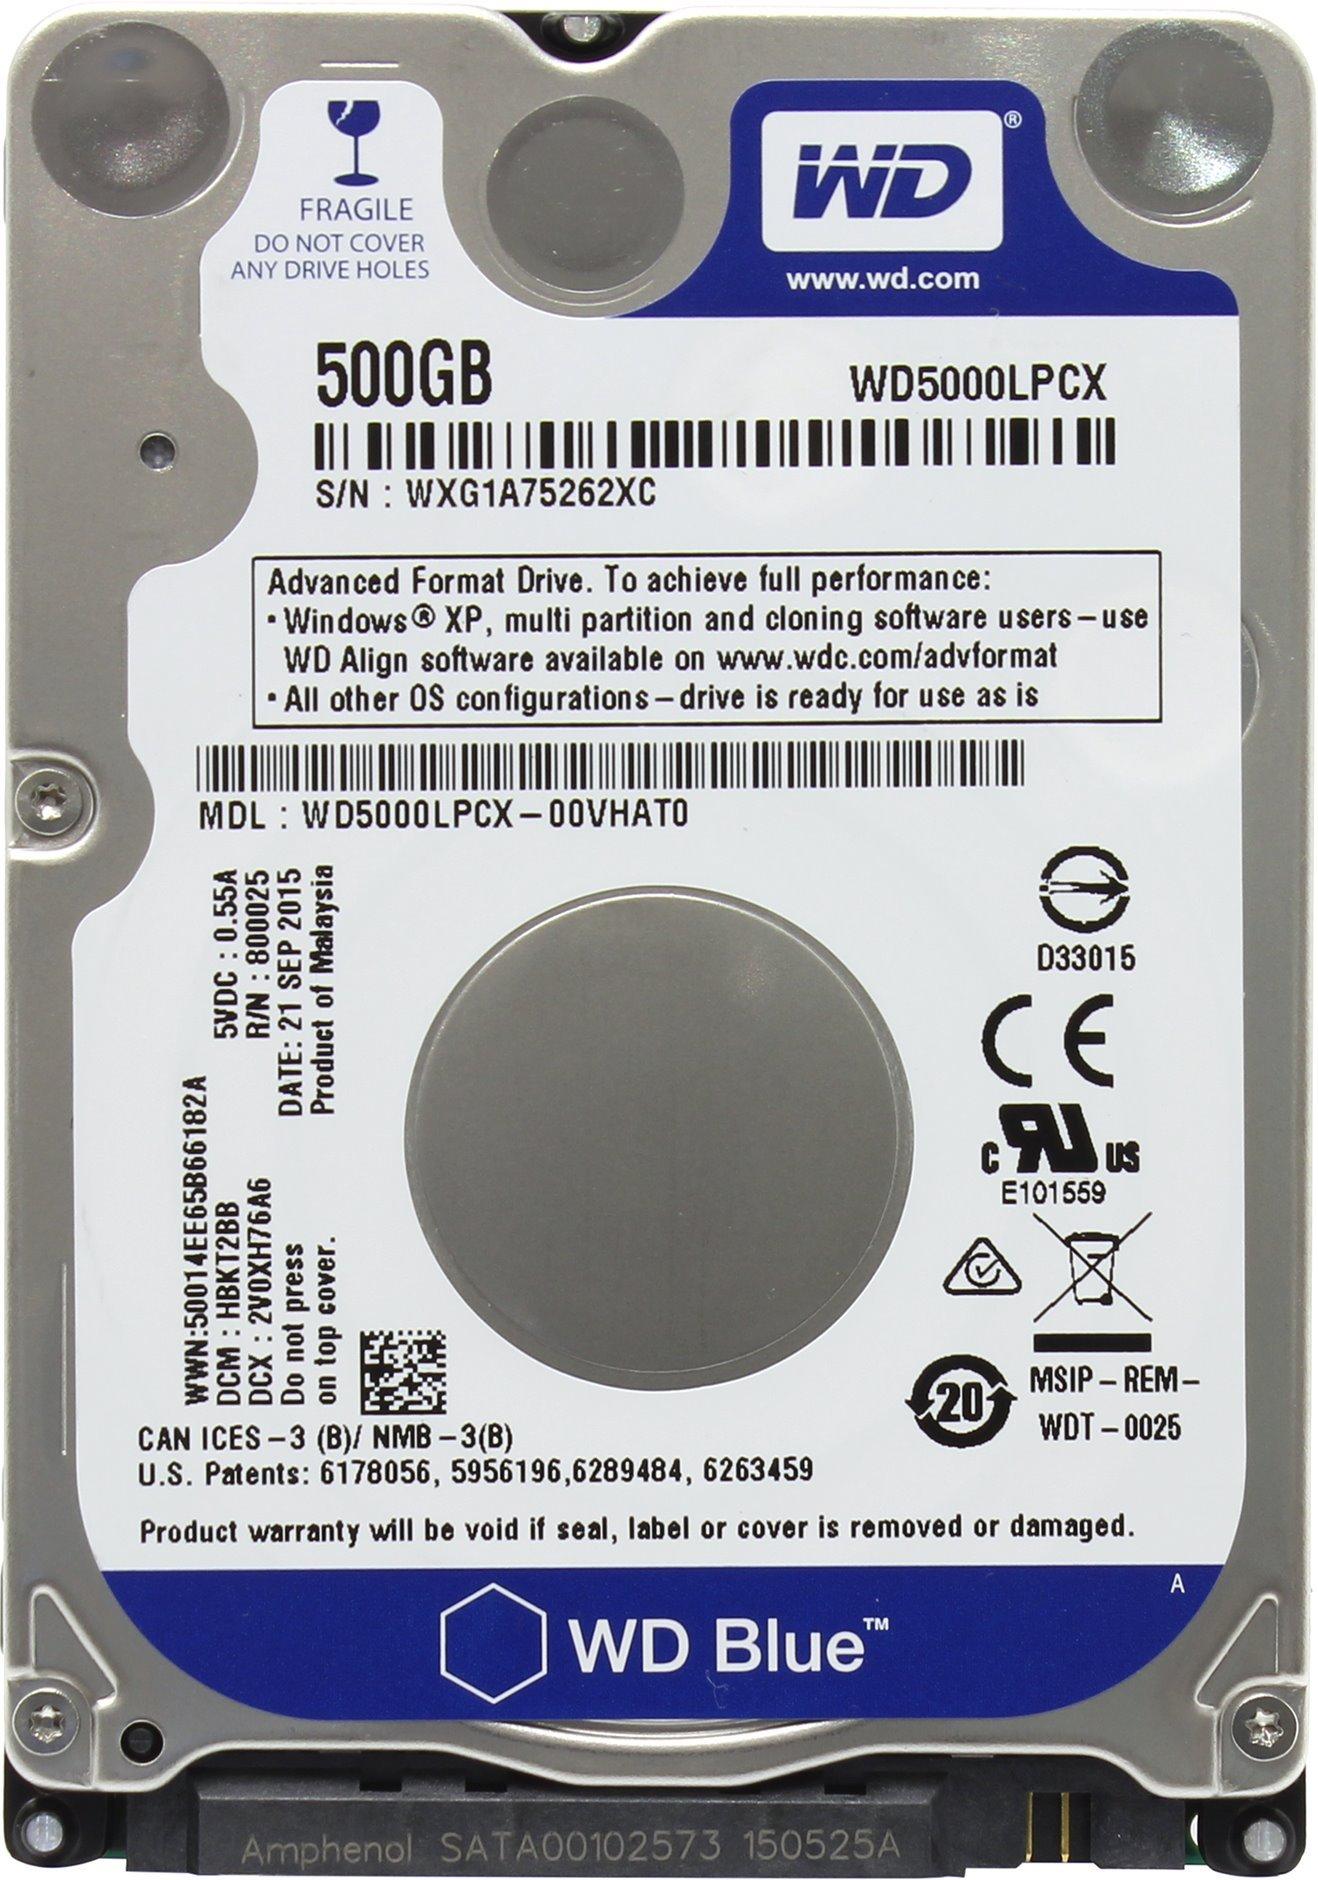 "Western Digital 500GB 2.5"" Playstation 3/Playstation 4 Hard Drive (PS3 Fat, PS3 Slim, PS3 Super Slim, PS4)"